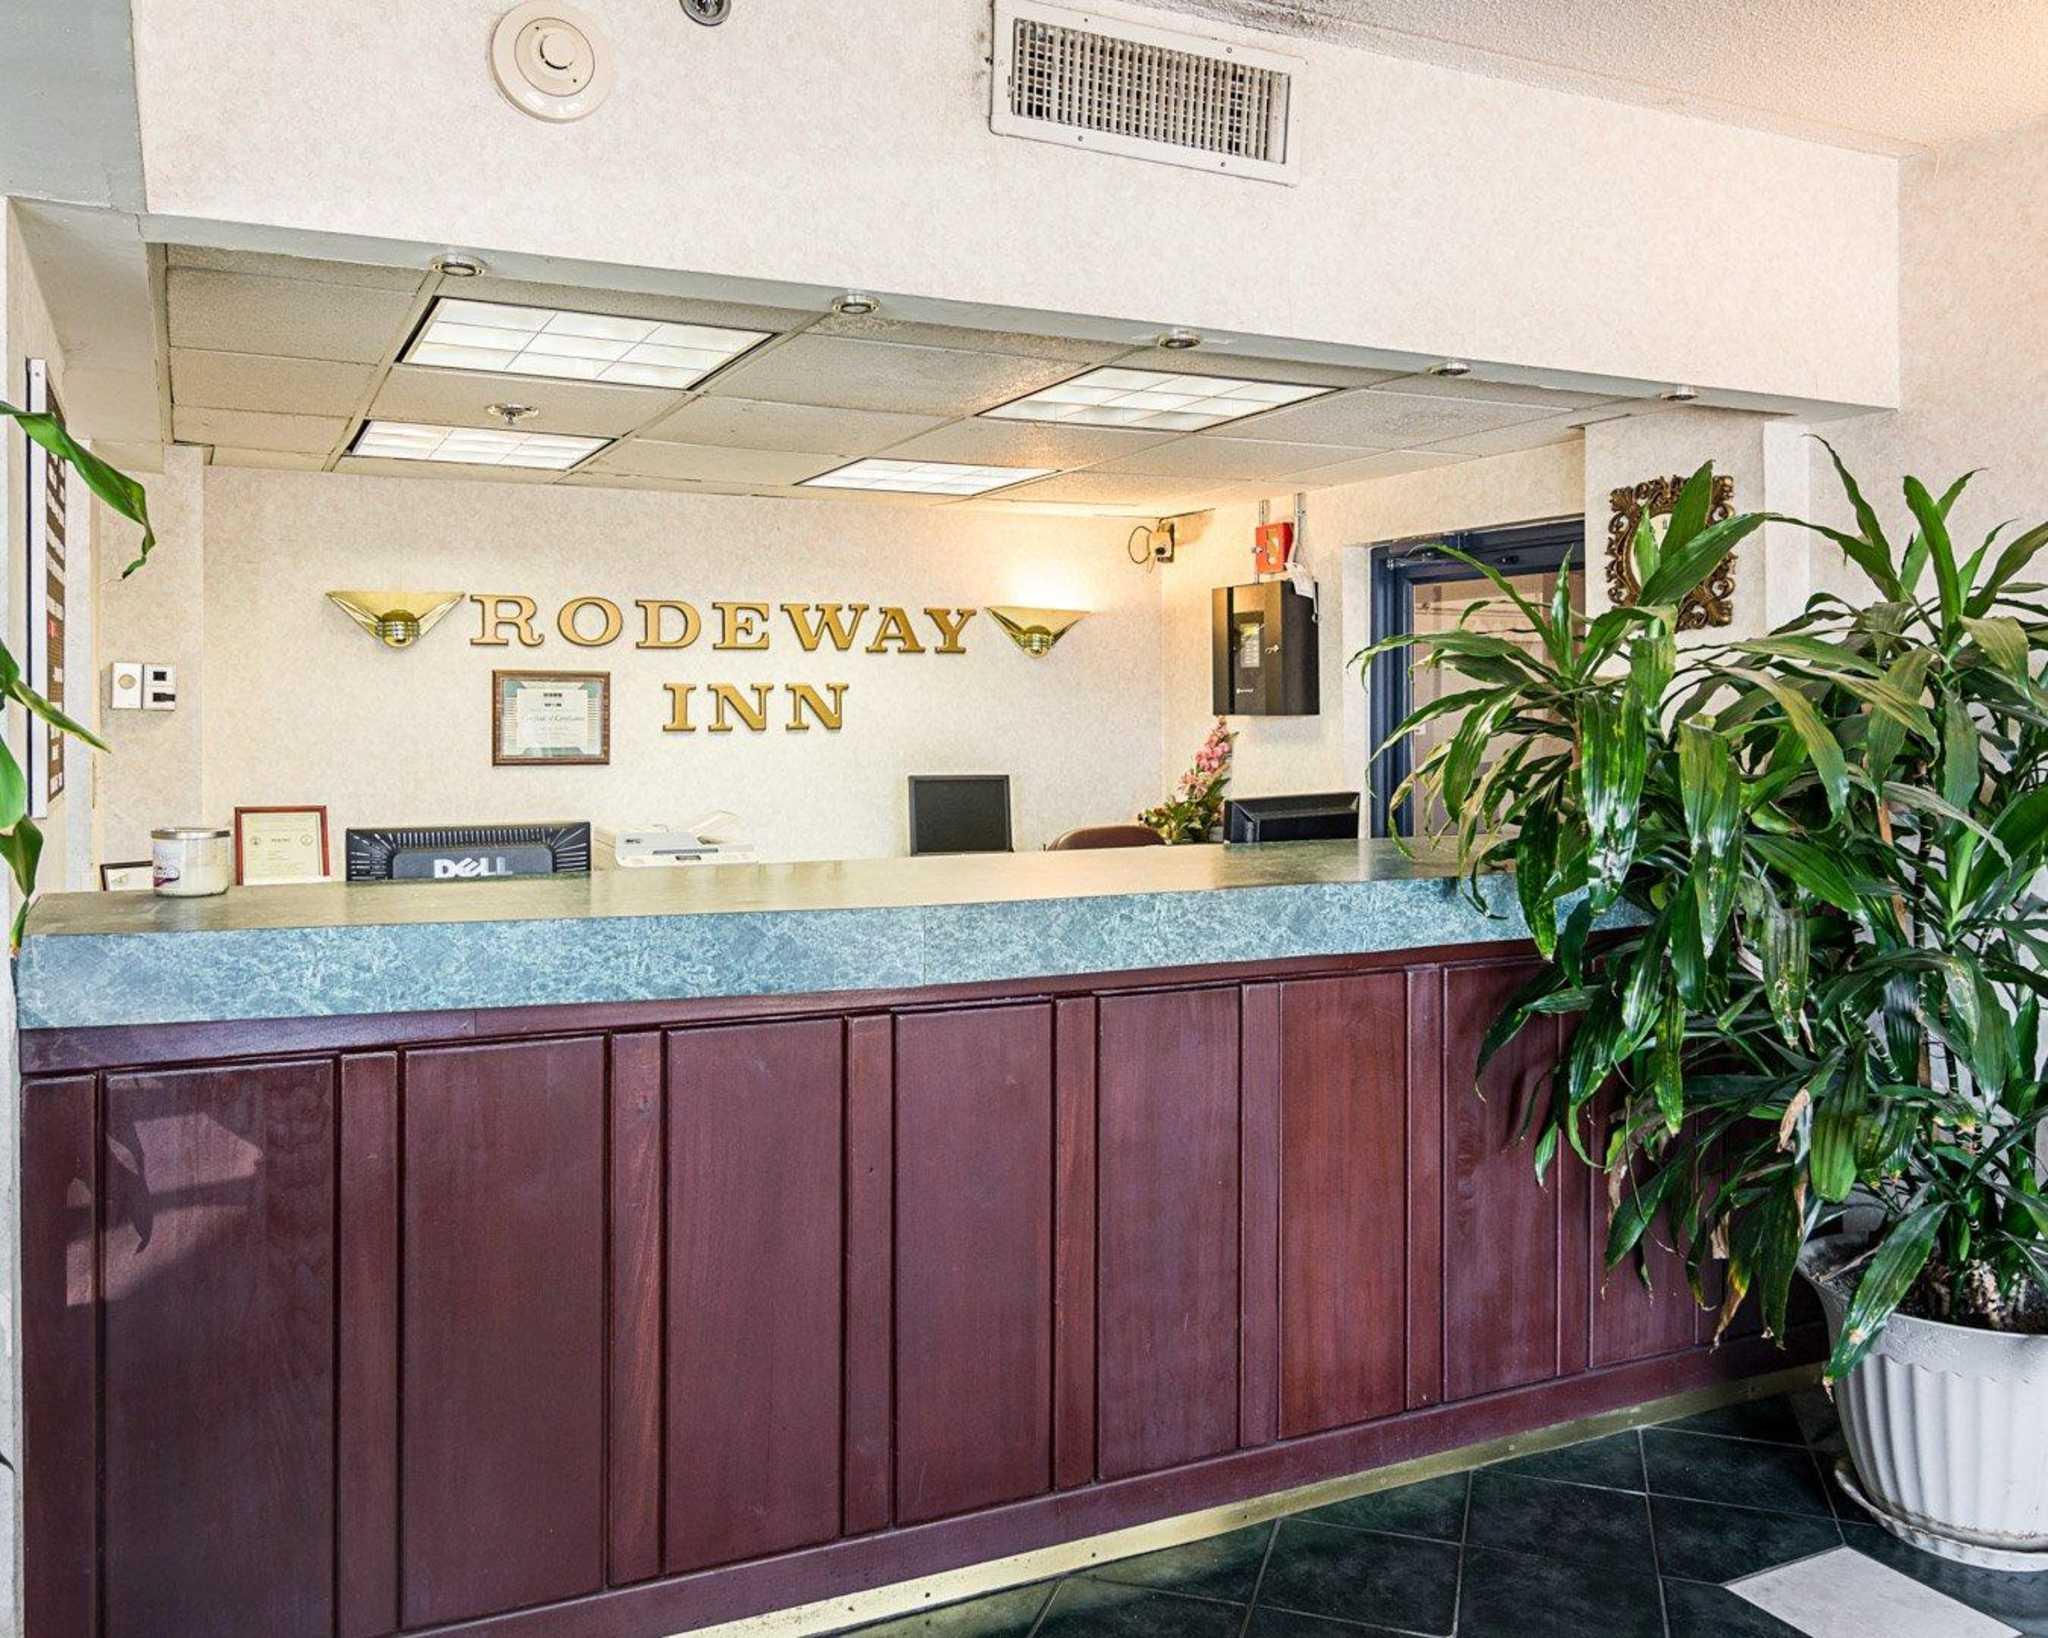 Rodeway Inn by the Beach image 3